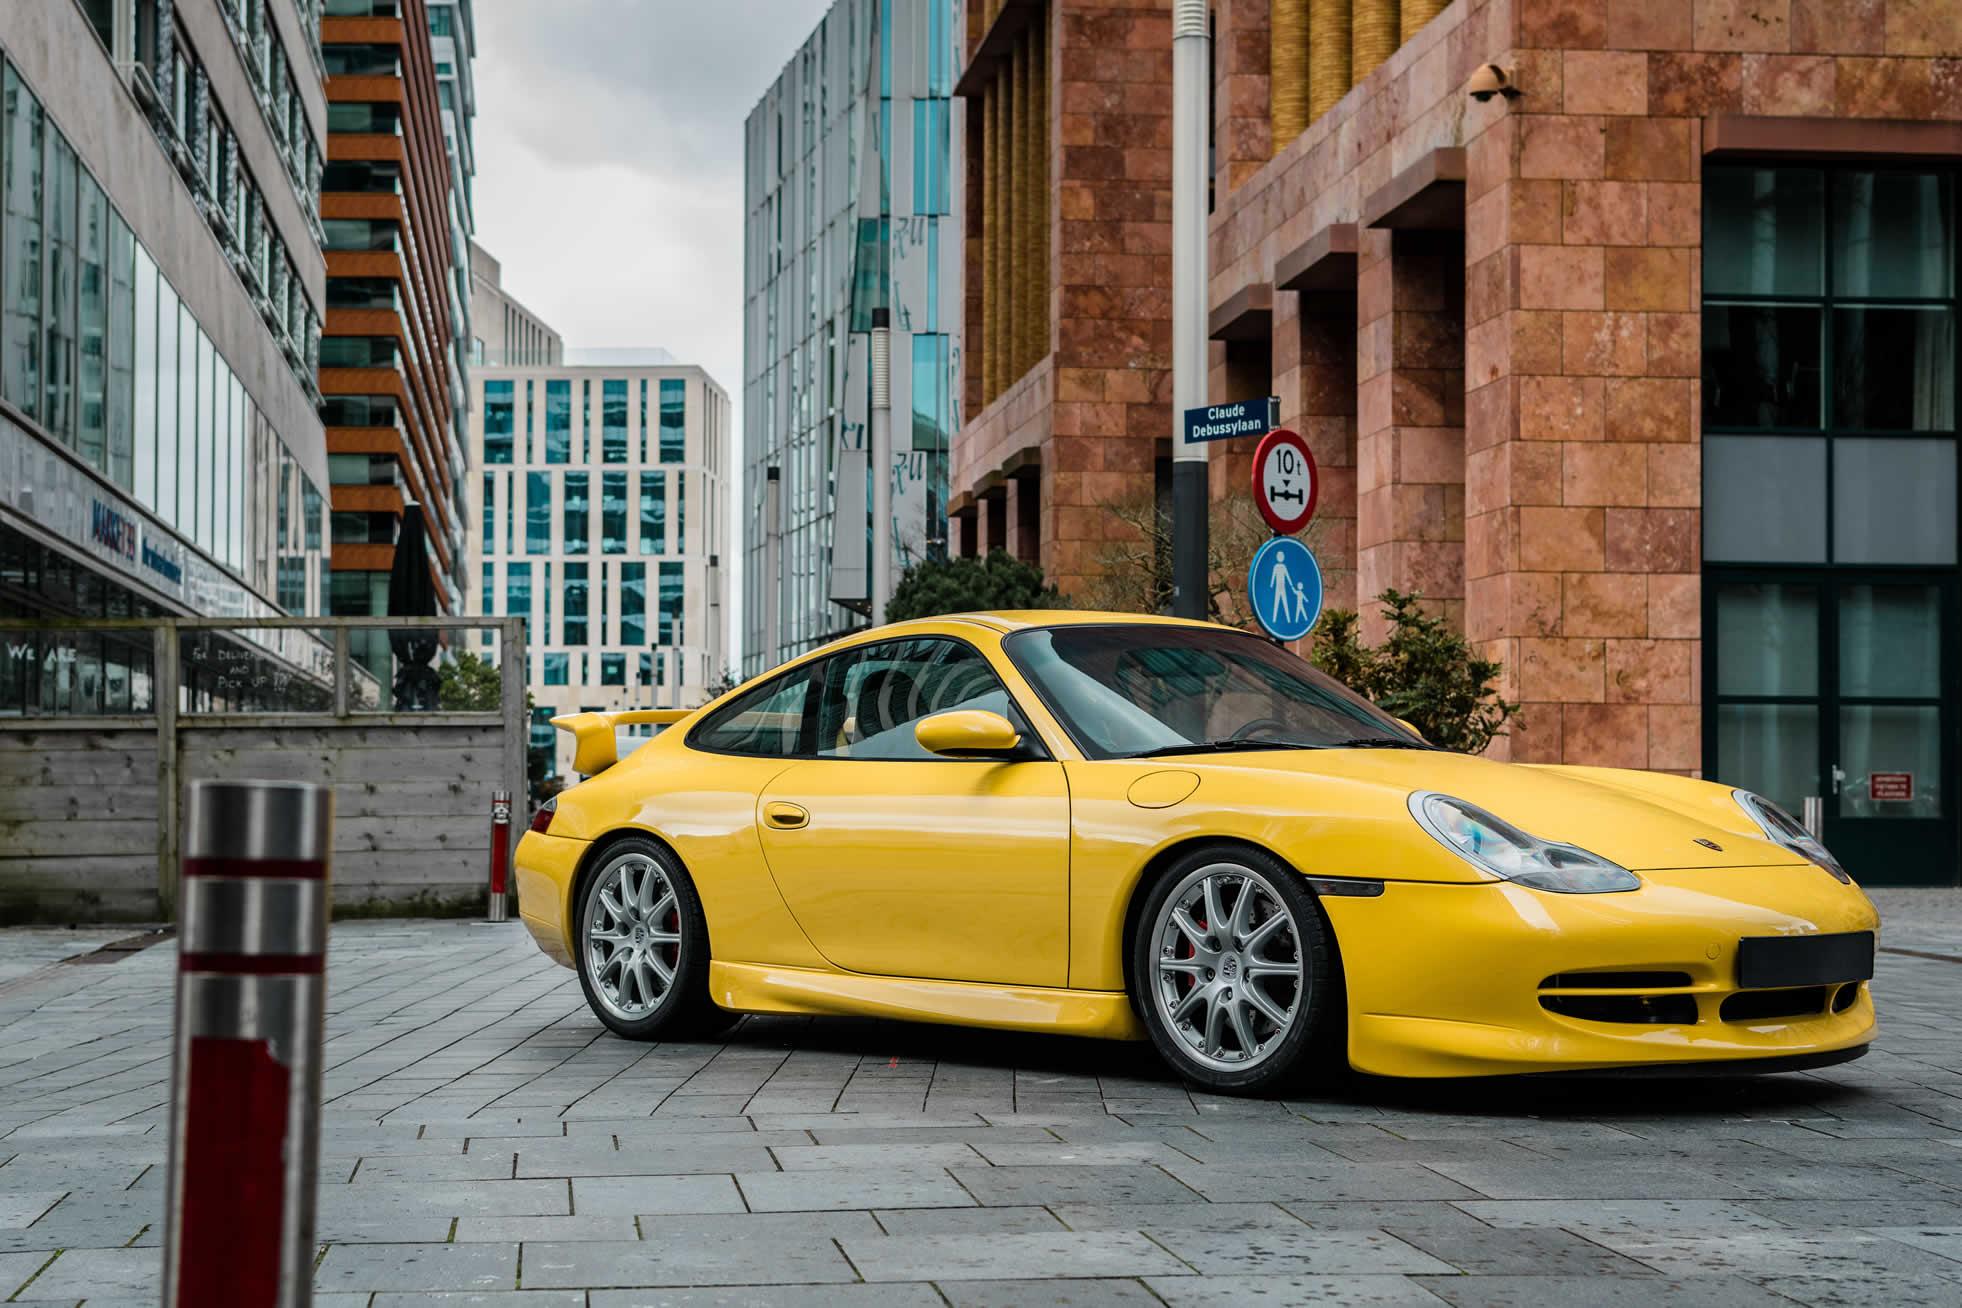 For sale, 2001 Porsche 996 GT3, Sports Purpose, Bicester Heritage